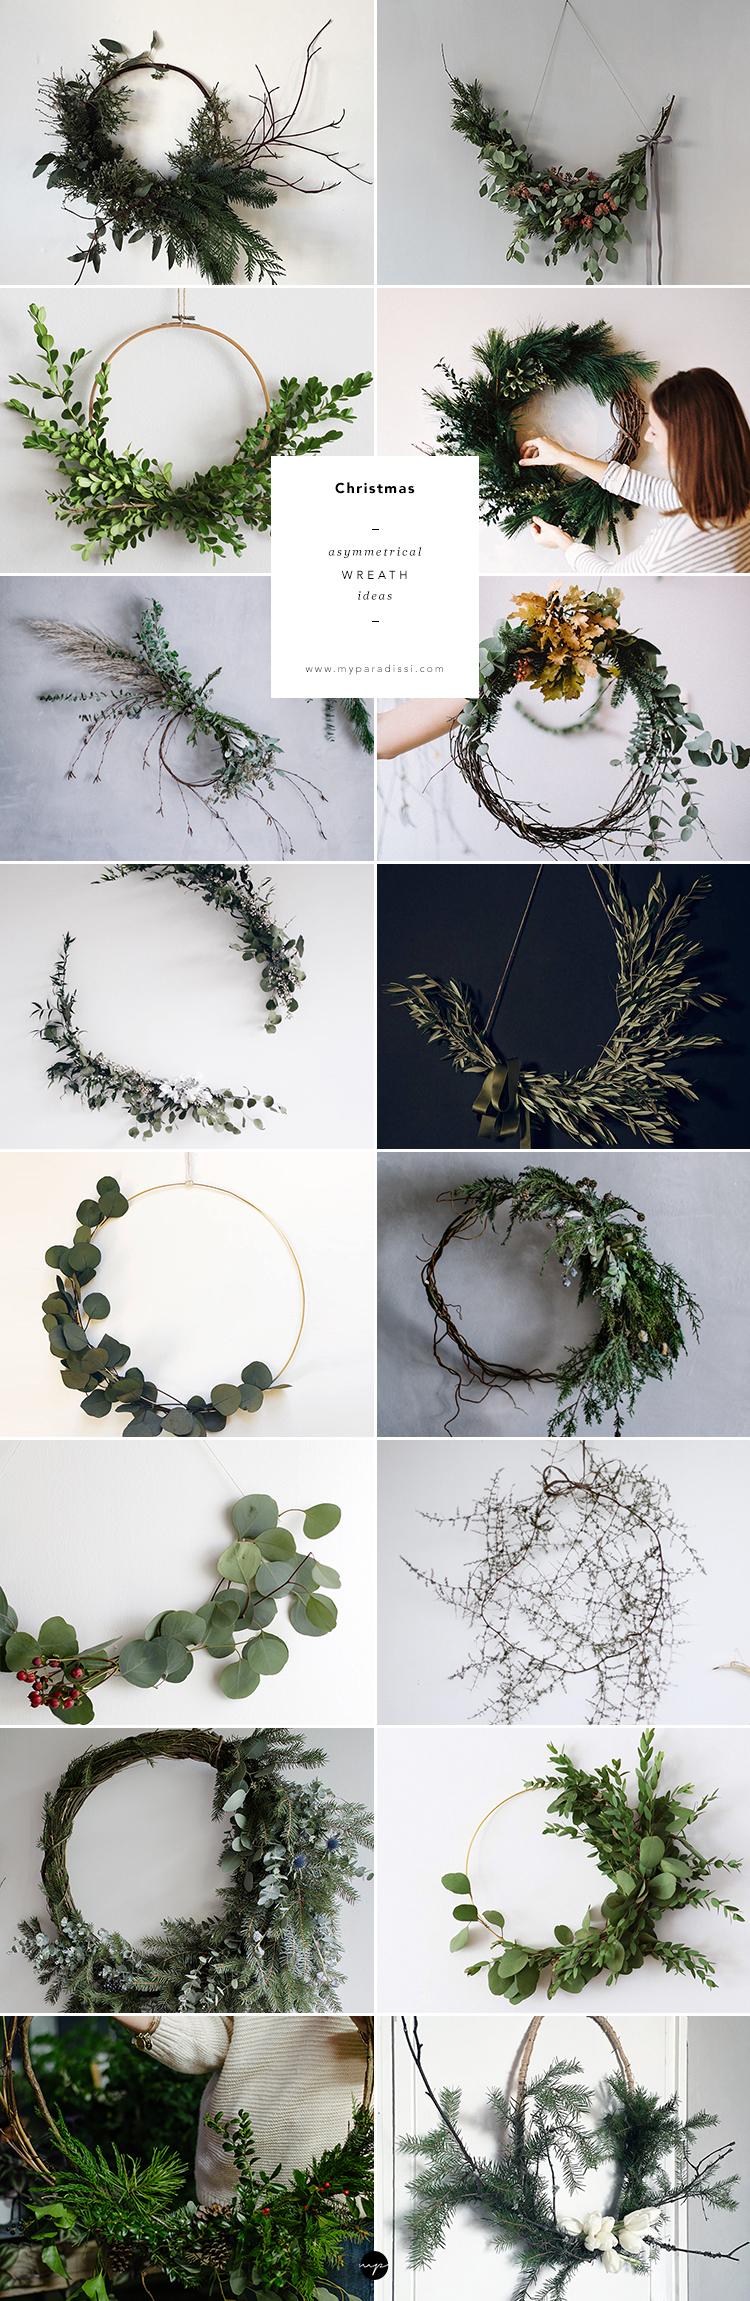 Asymmetrical wreath ideas